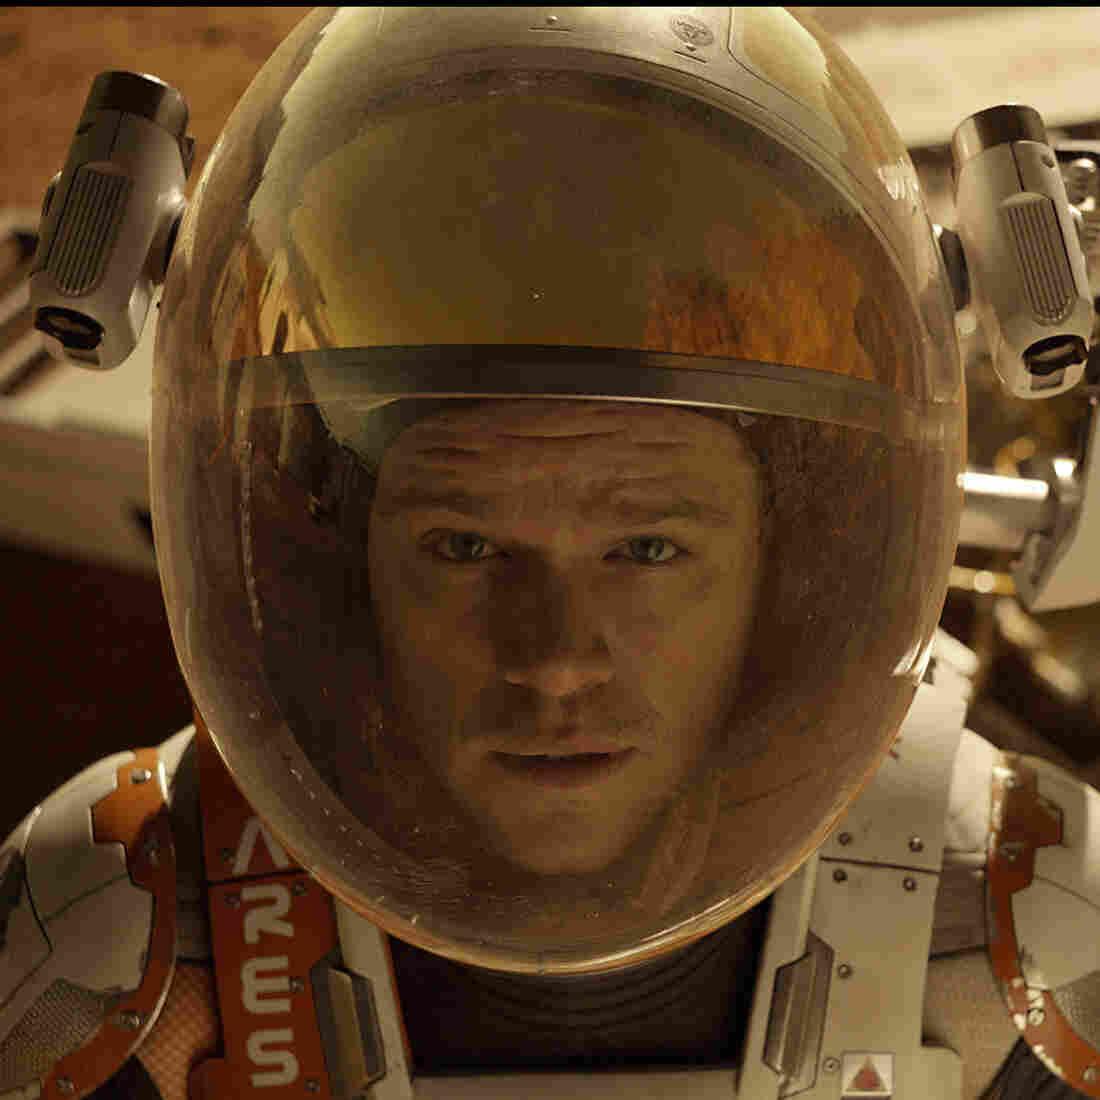 Matt Damon as Astronaut Mark Watney in The Martian.